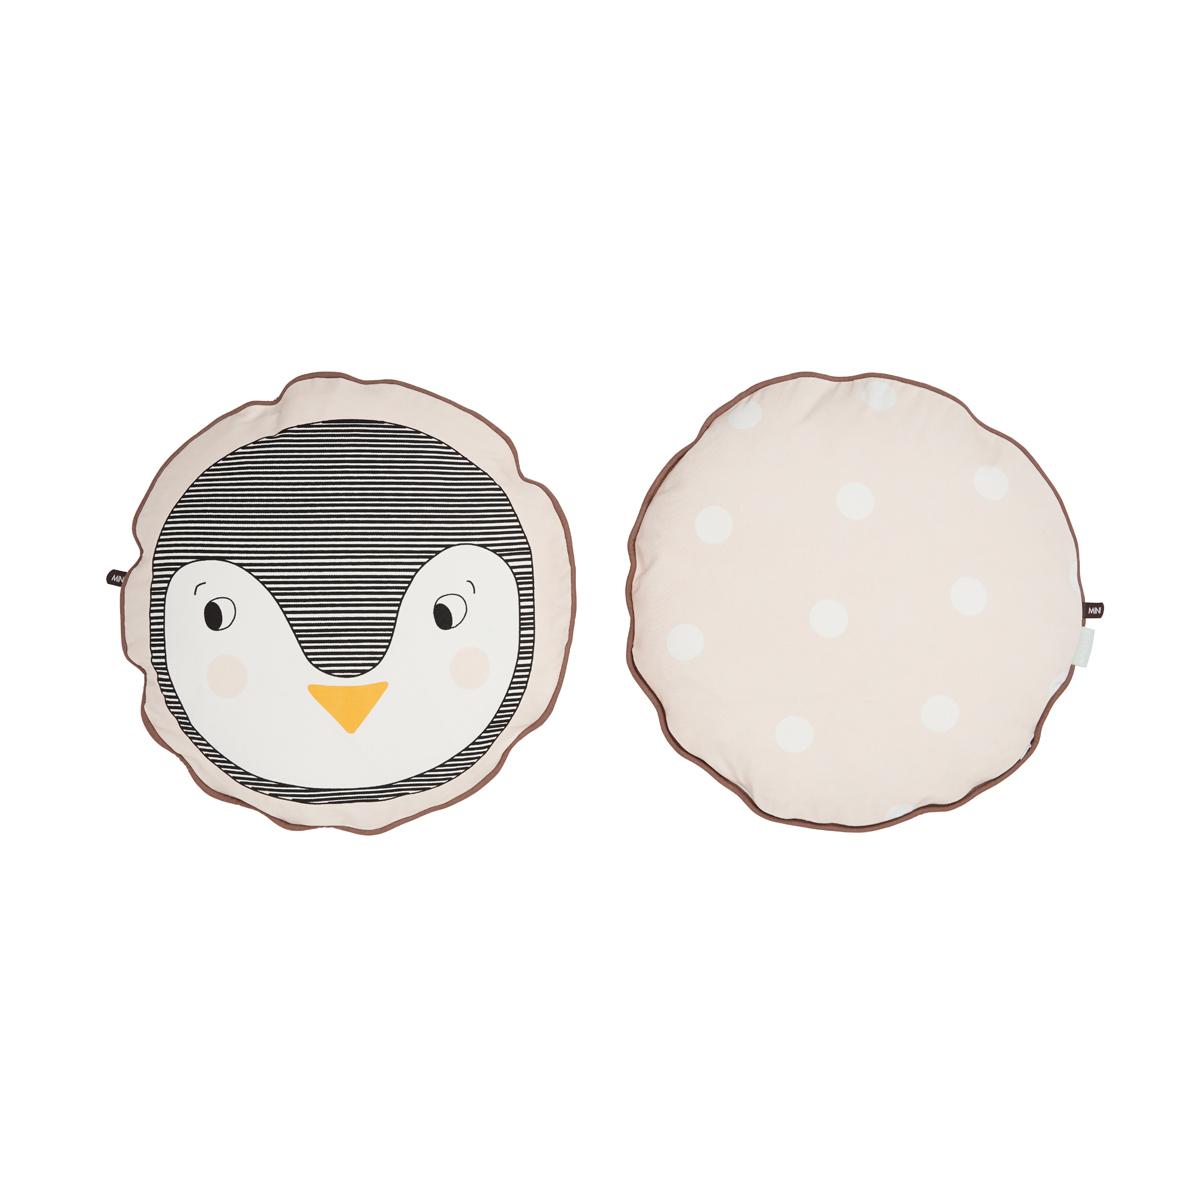 Coussin Coussin Pingouin Coussin Pingouin